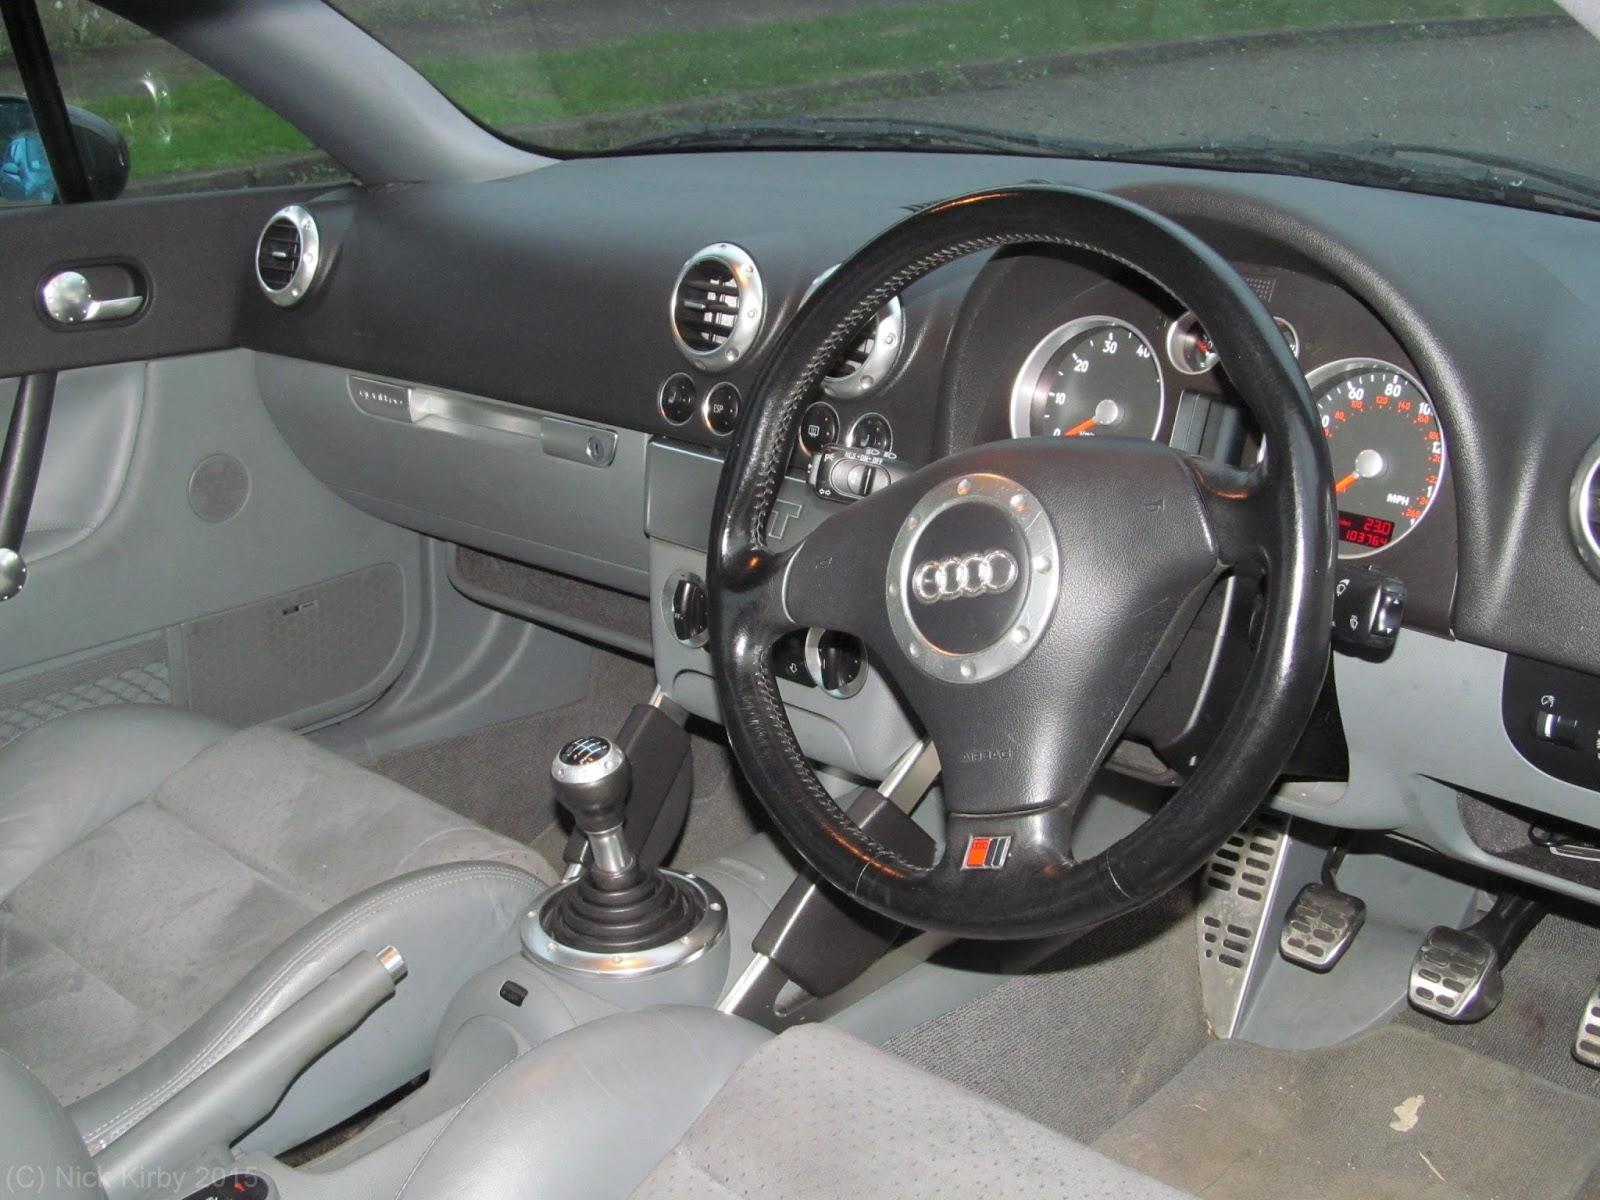 Kirby's Car Blog: Audi TT Mk1 Coupe Drive